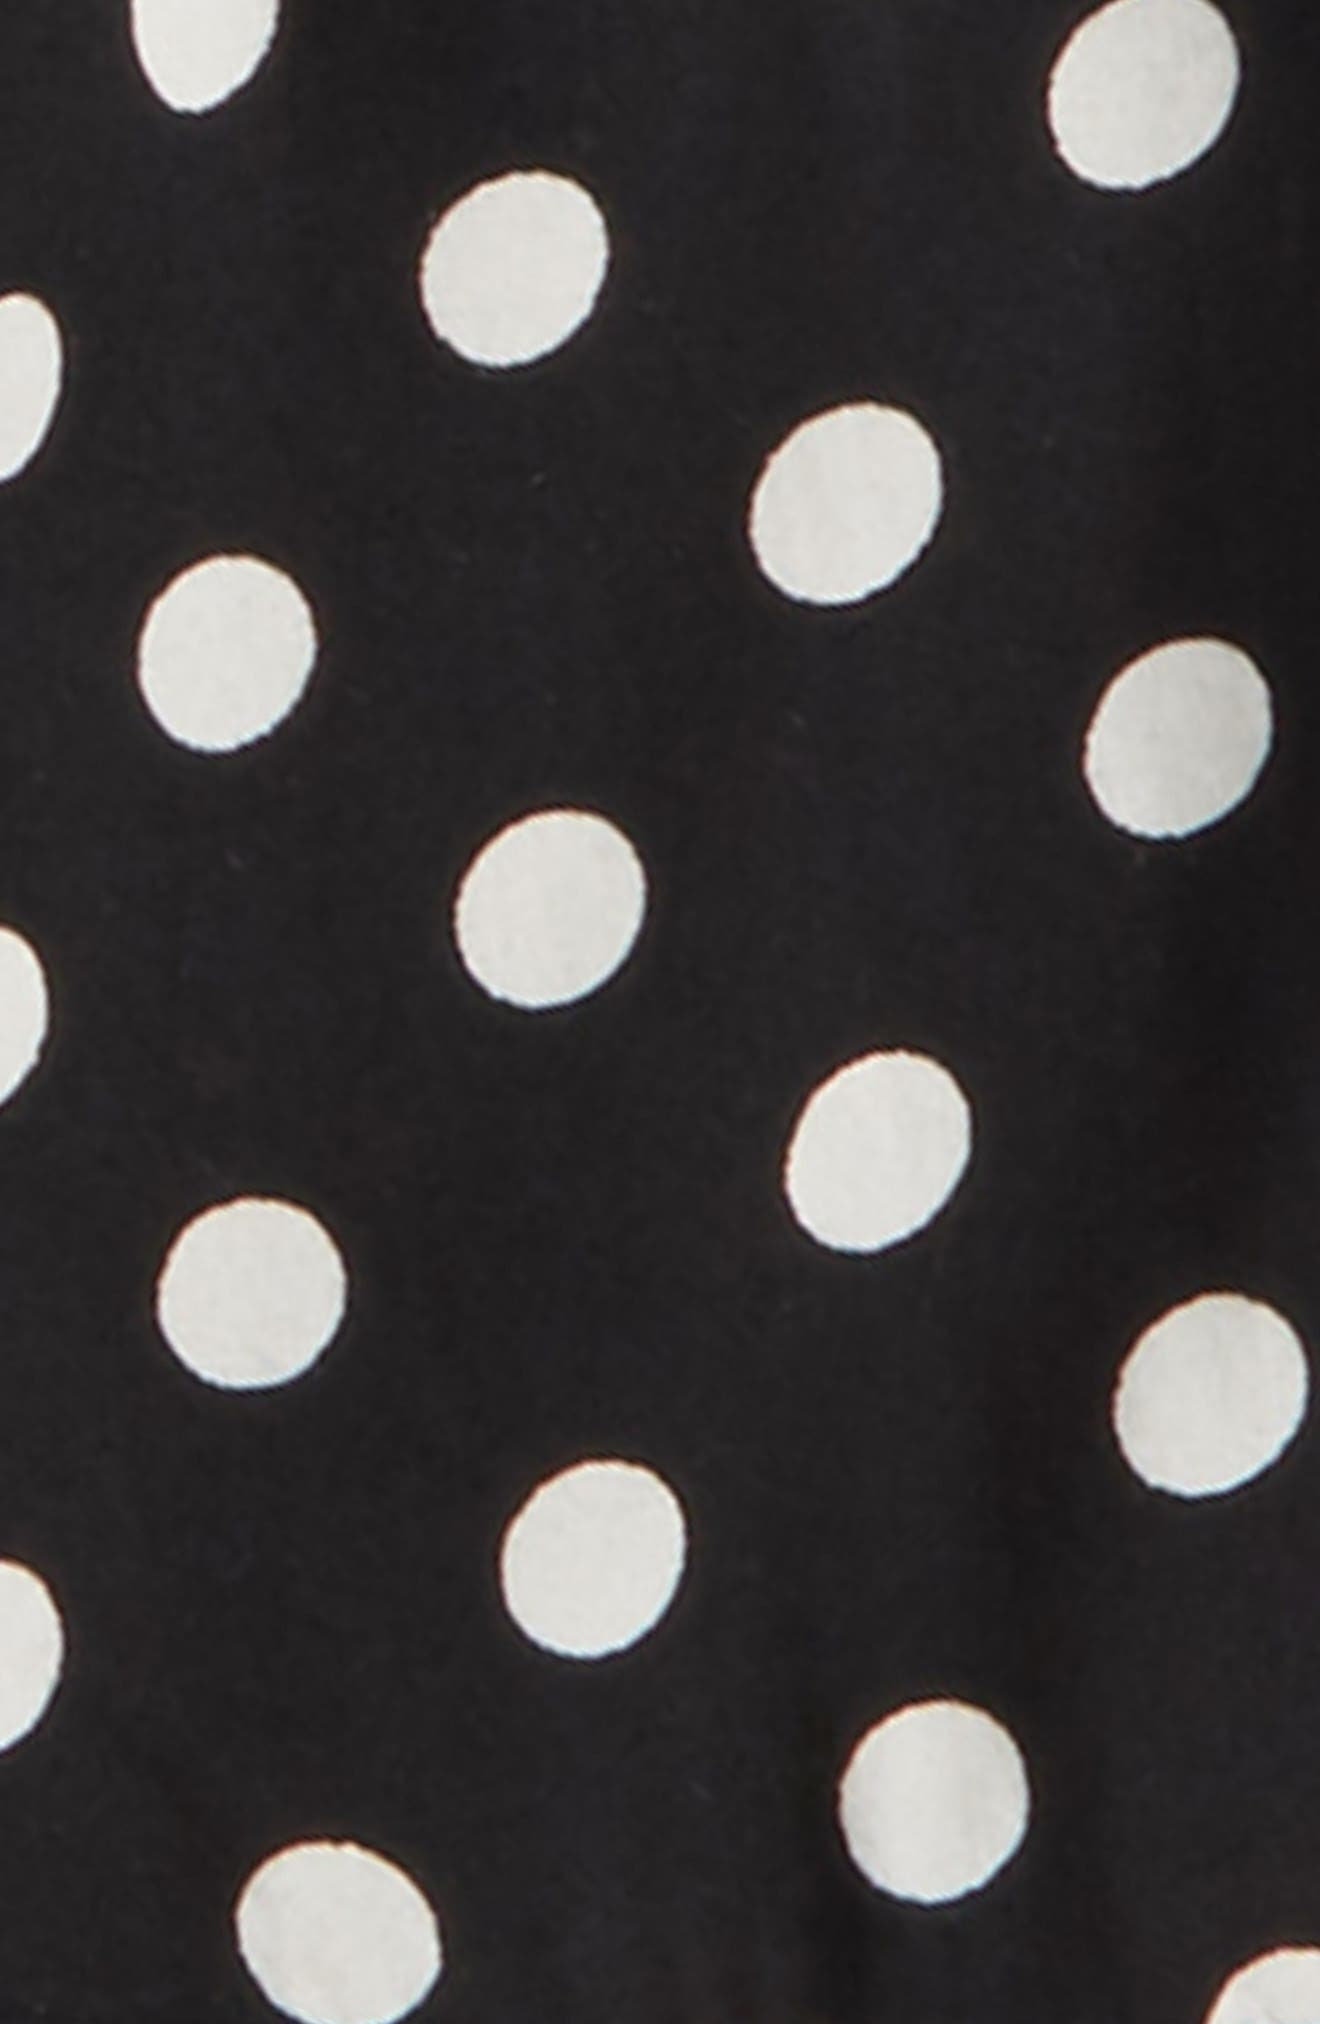 Alternate Image 2  - Zoe and Rose Polka Dot Bell Sleeve Top (Big Girls)